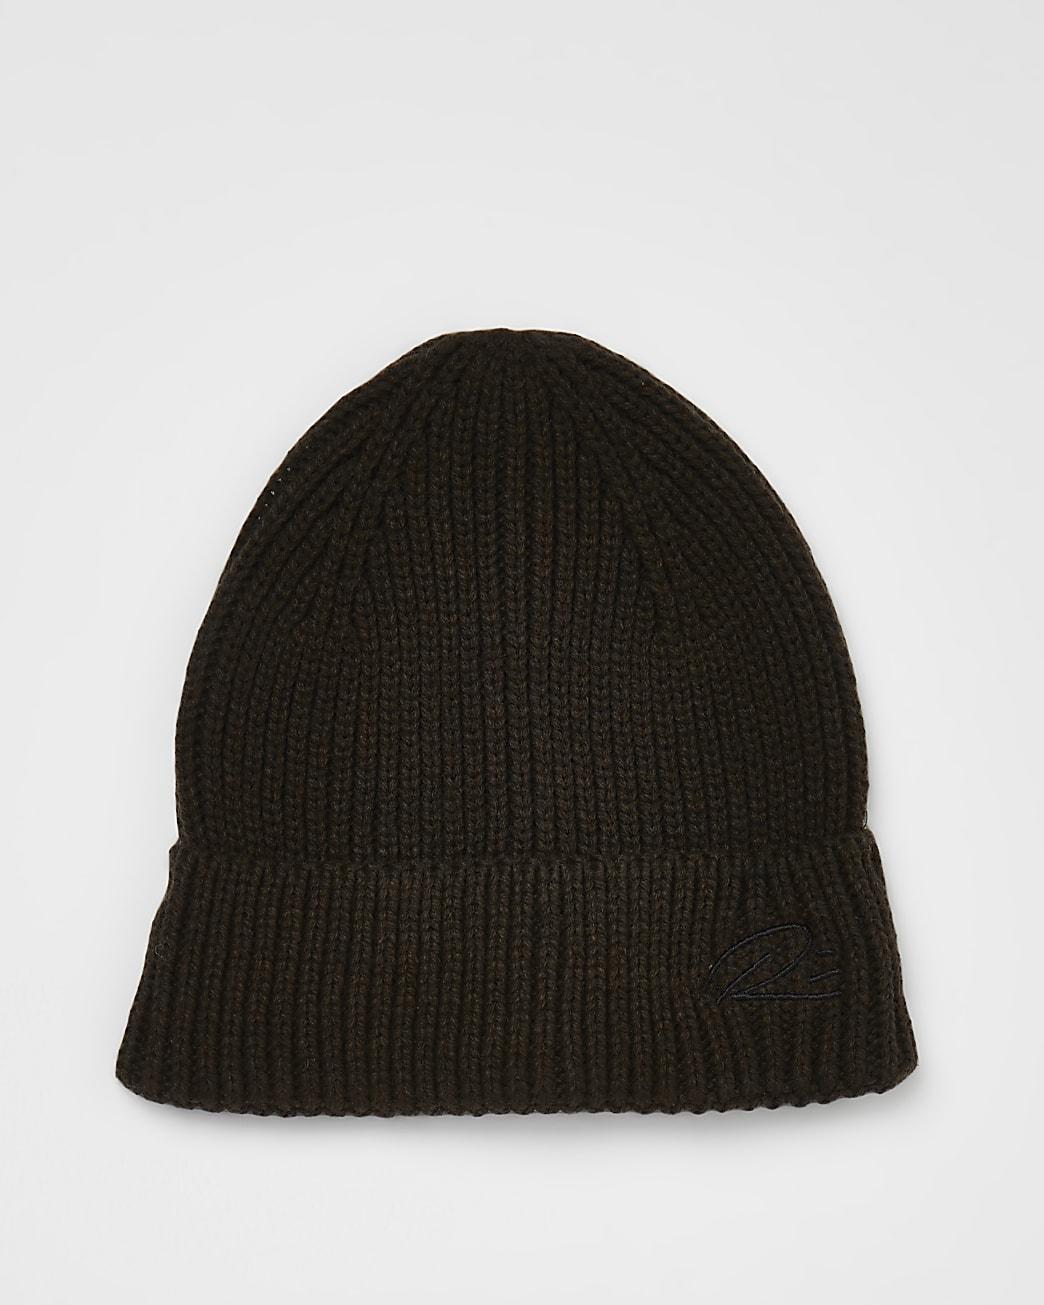 Brown RI branded docker beanie hat